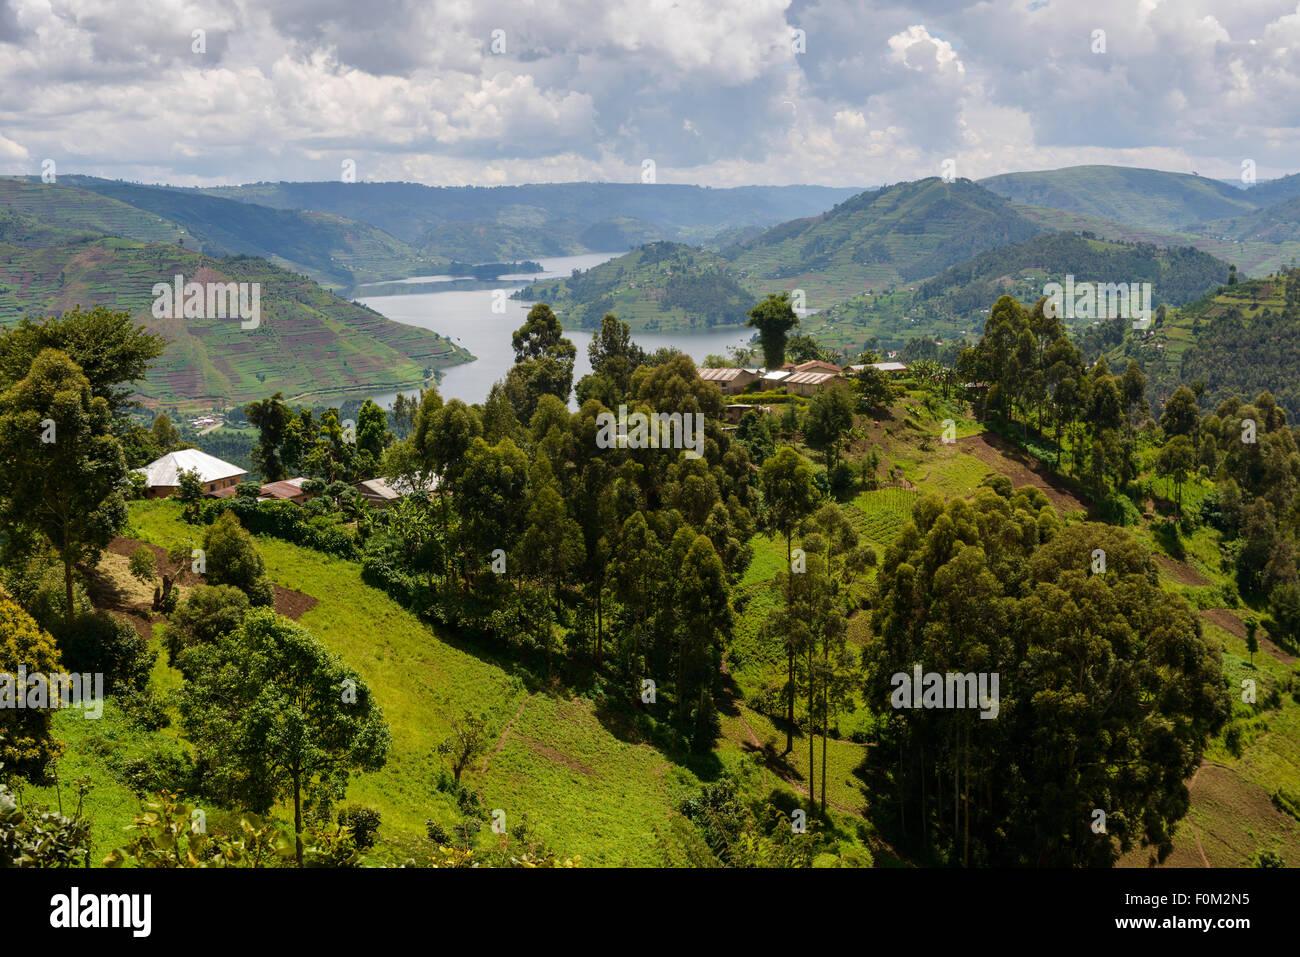 Con vistas al lago Bunyonyi, Uganda, África Imagen De Stock